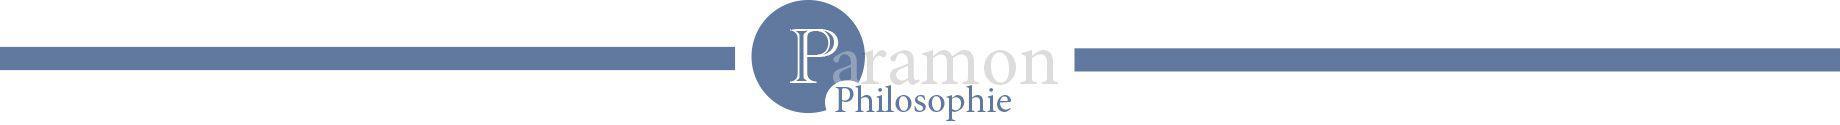 Philosophie-Verlag-Paramon